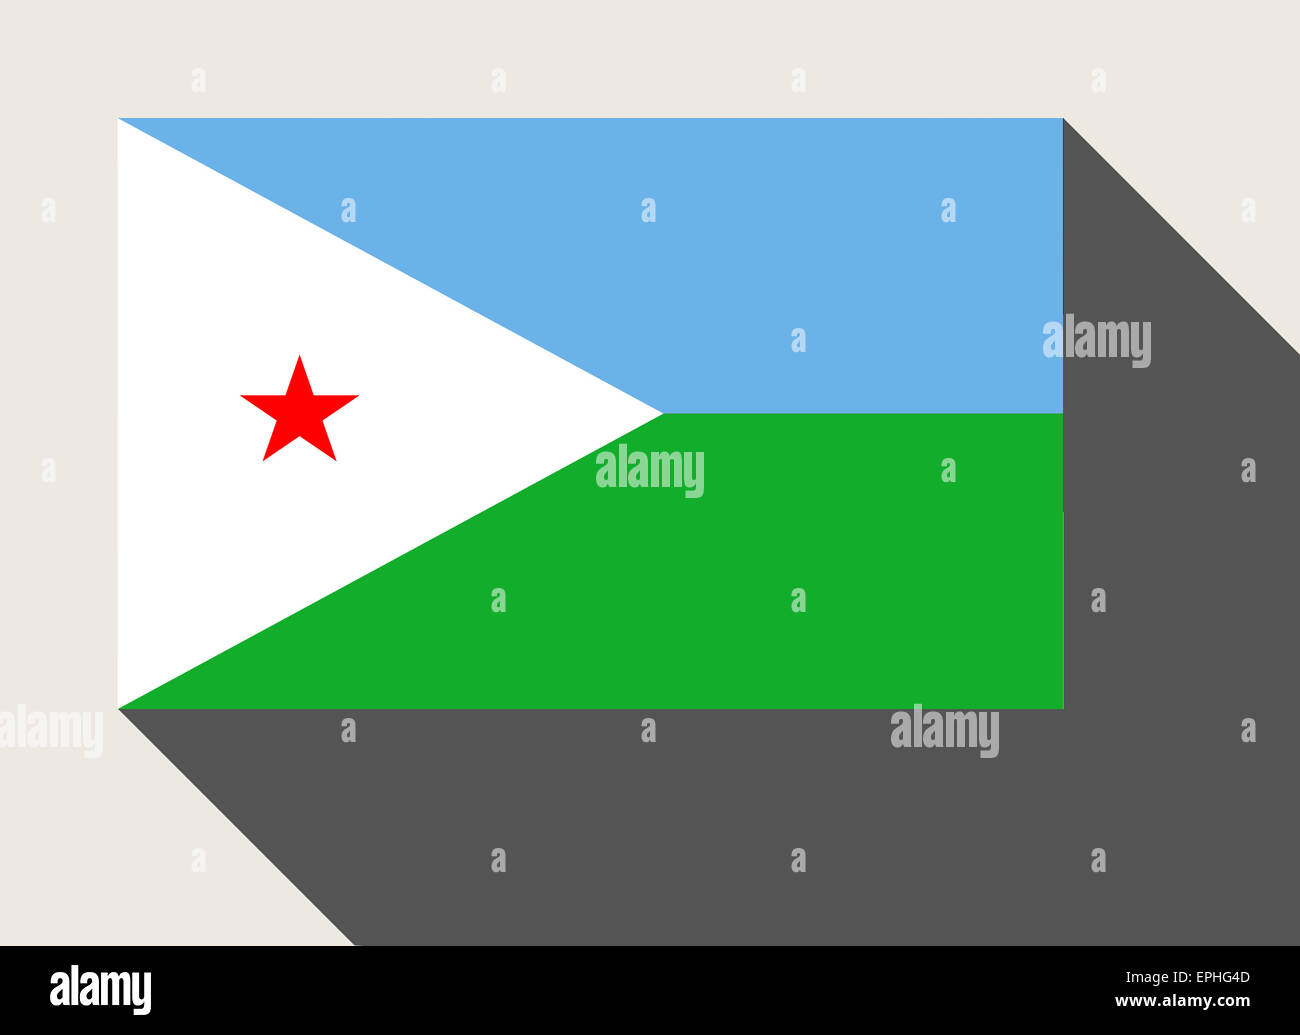 Djibouti flag in flat web design style. Stock Photo